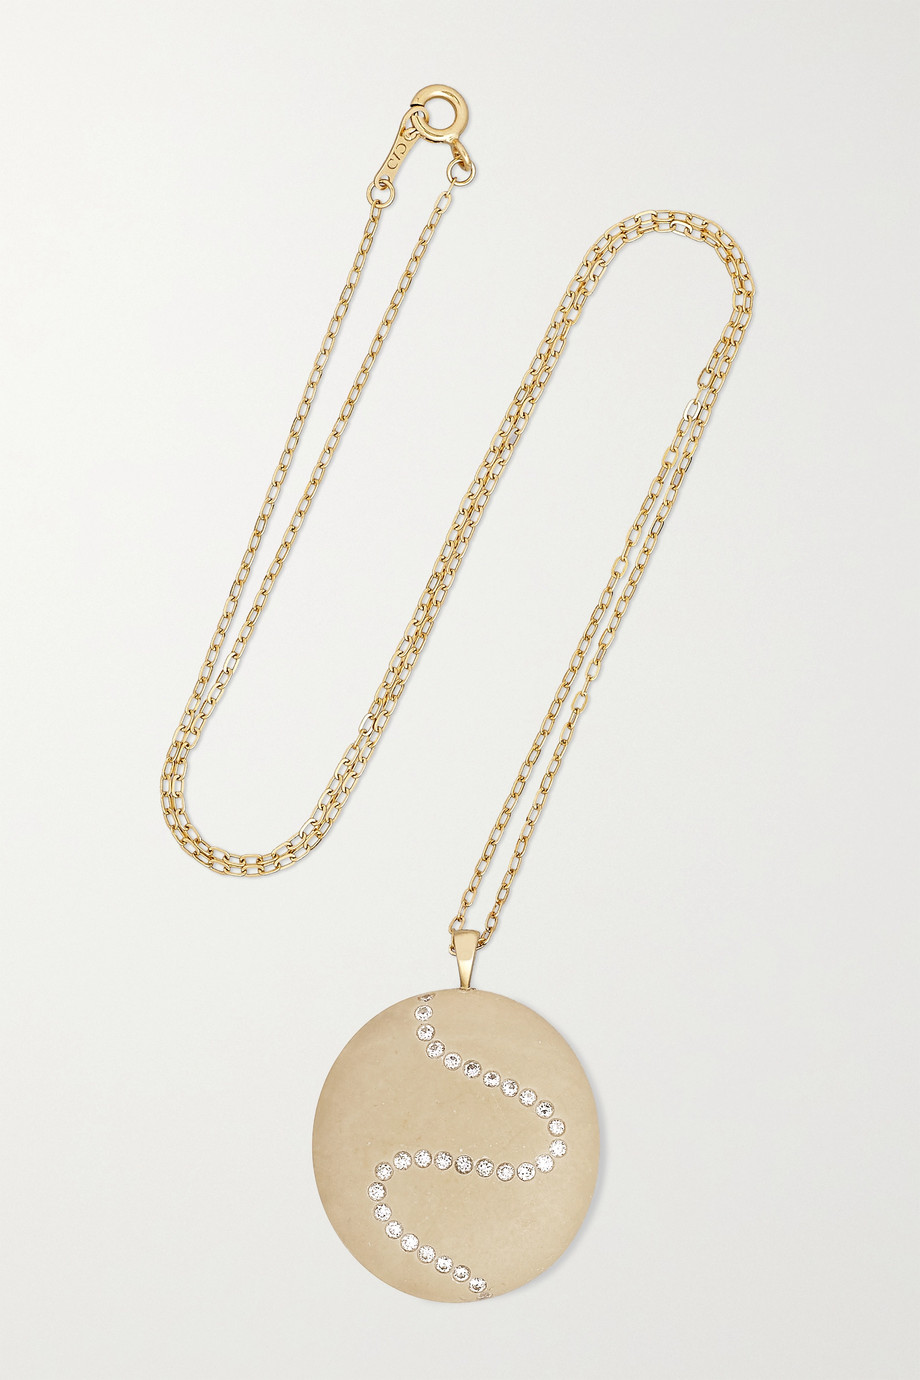 CVC Stones Beata 18-karat gold, stone and diamond necklace